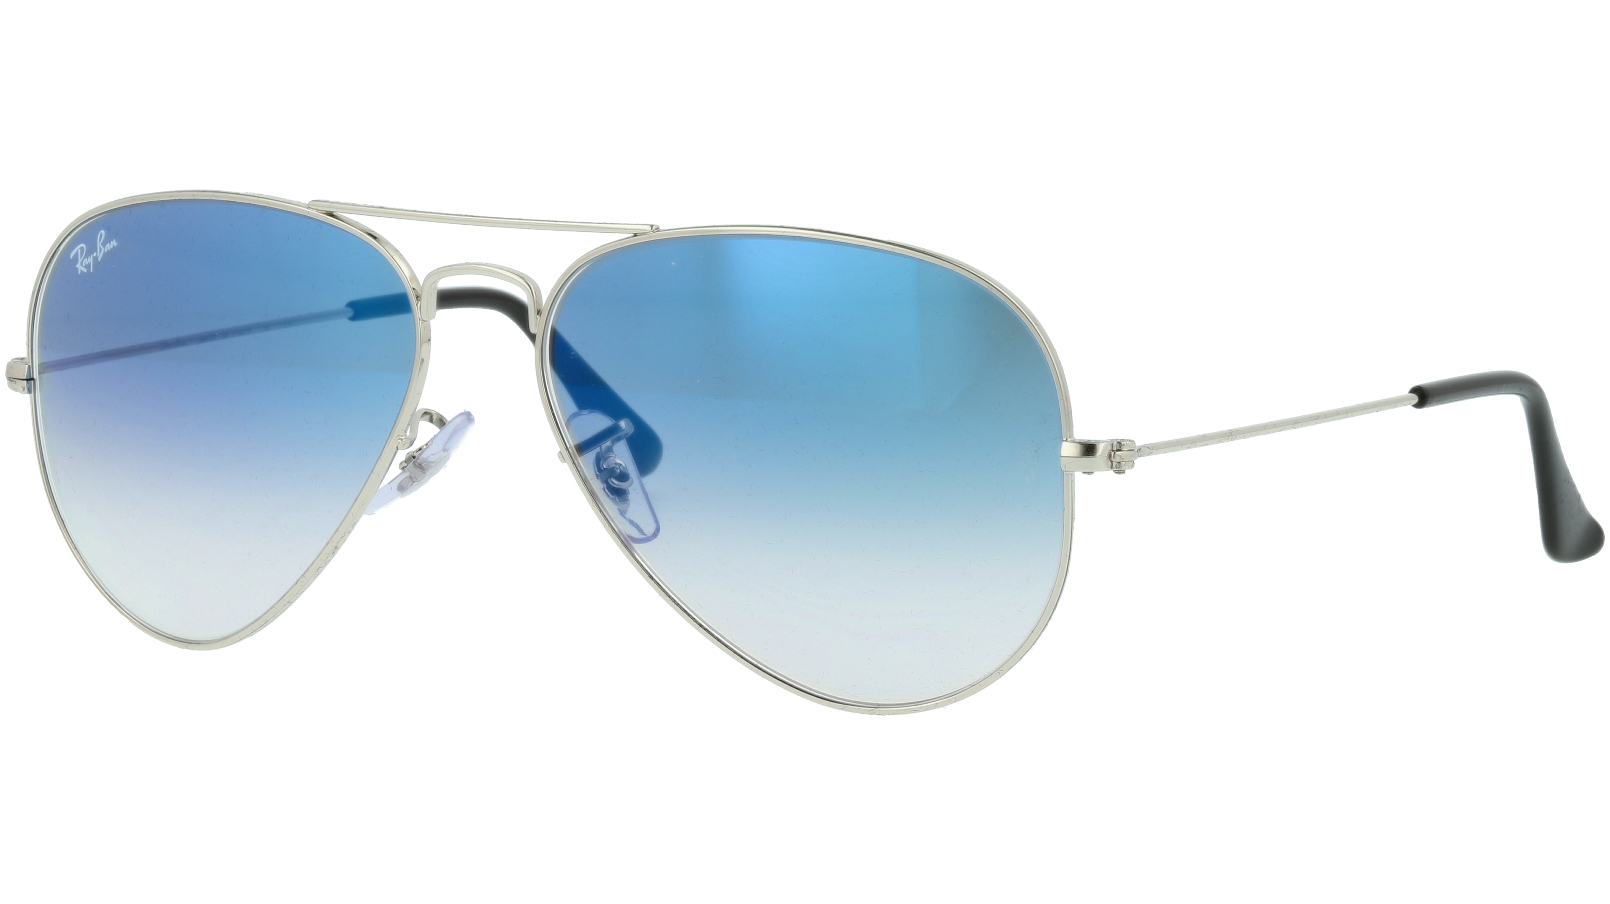 Ray-Ban RB3025 003/3F 58 Silver Pilot Sunglasses